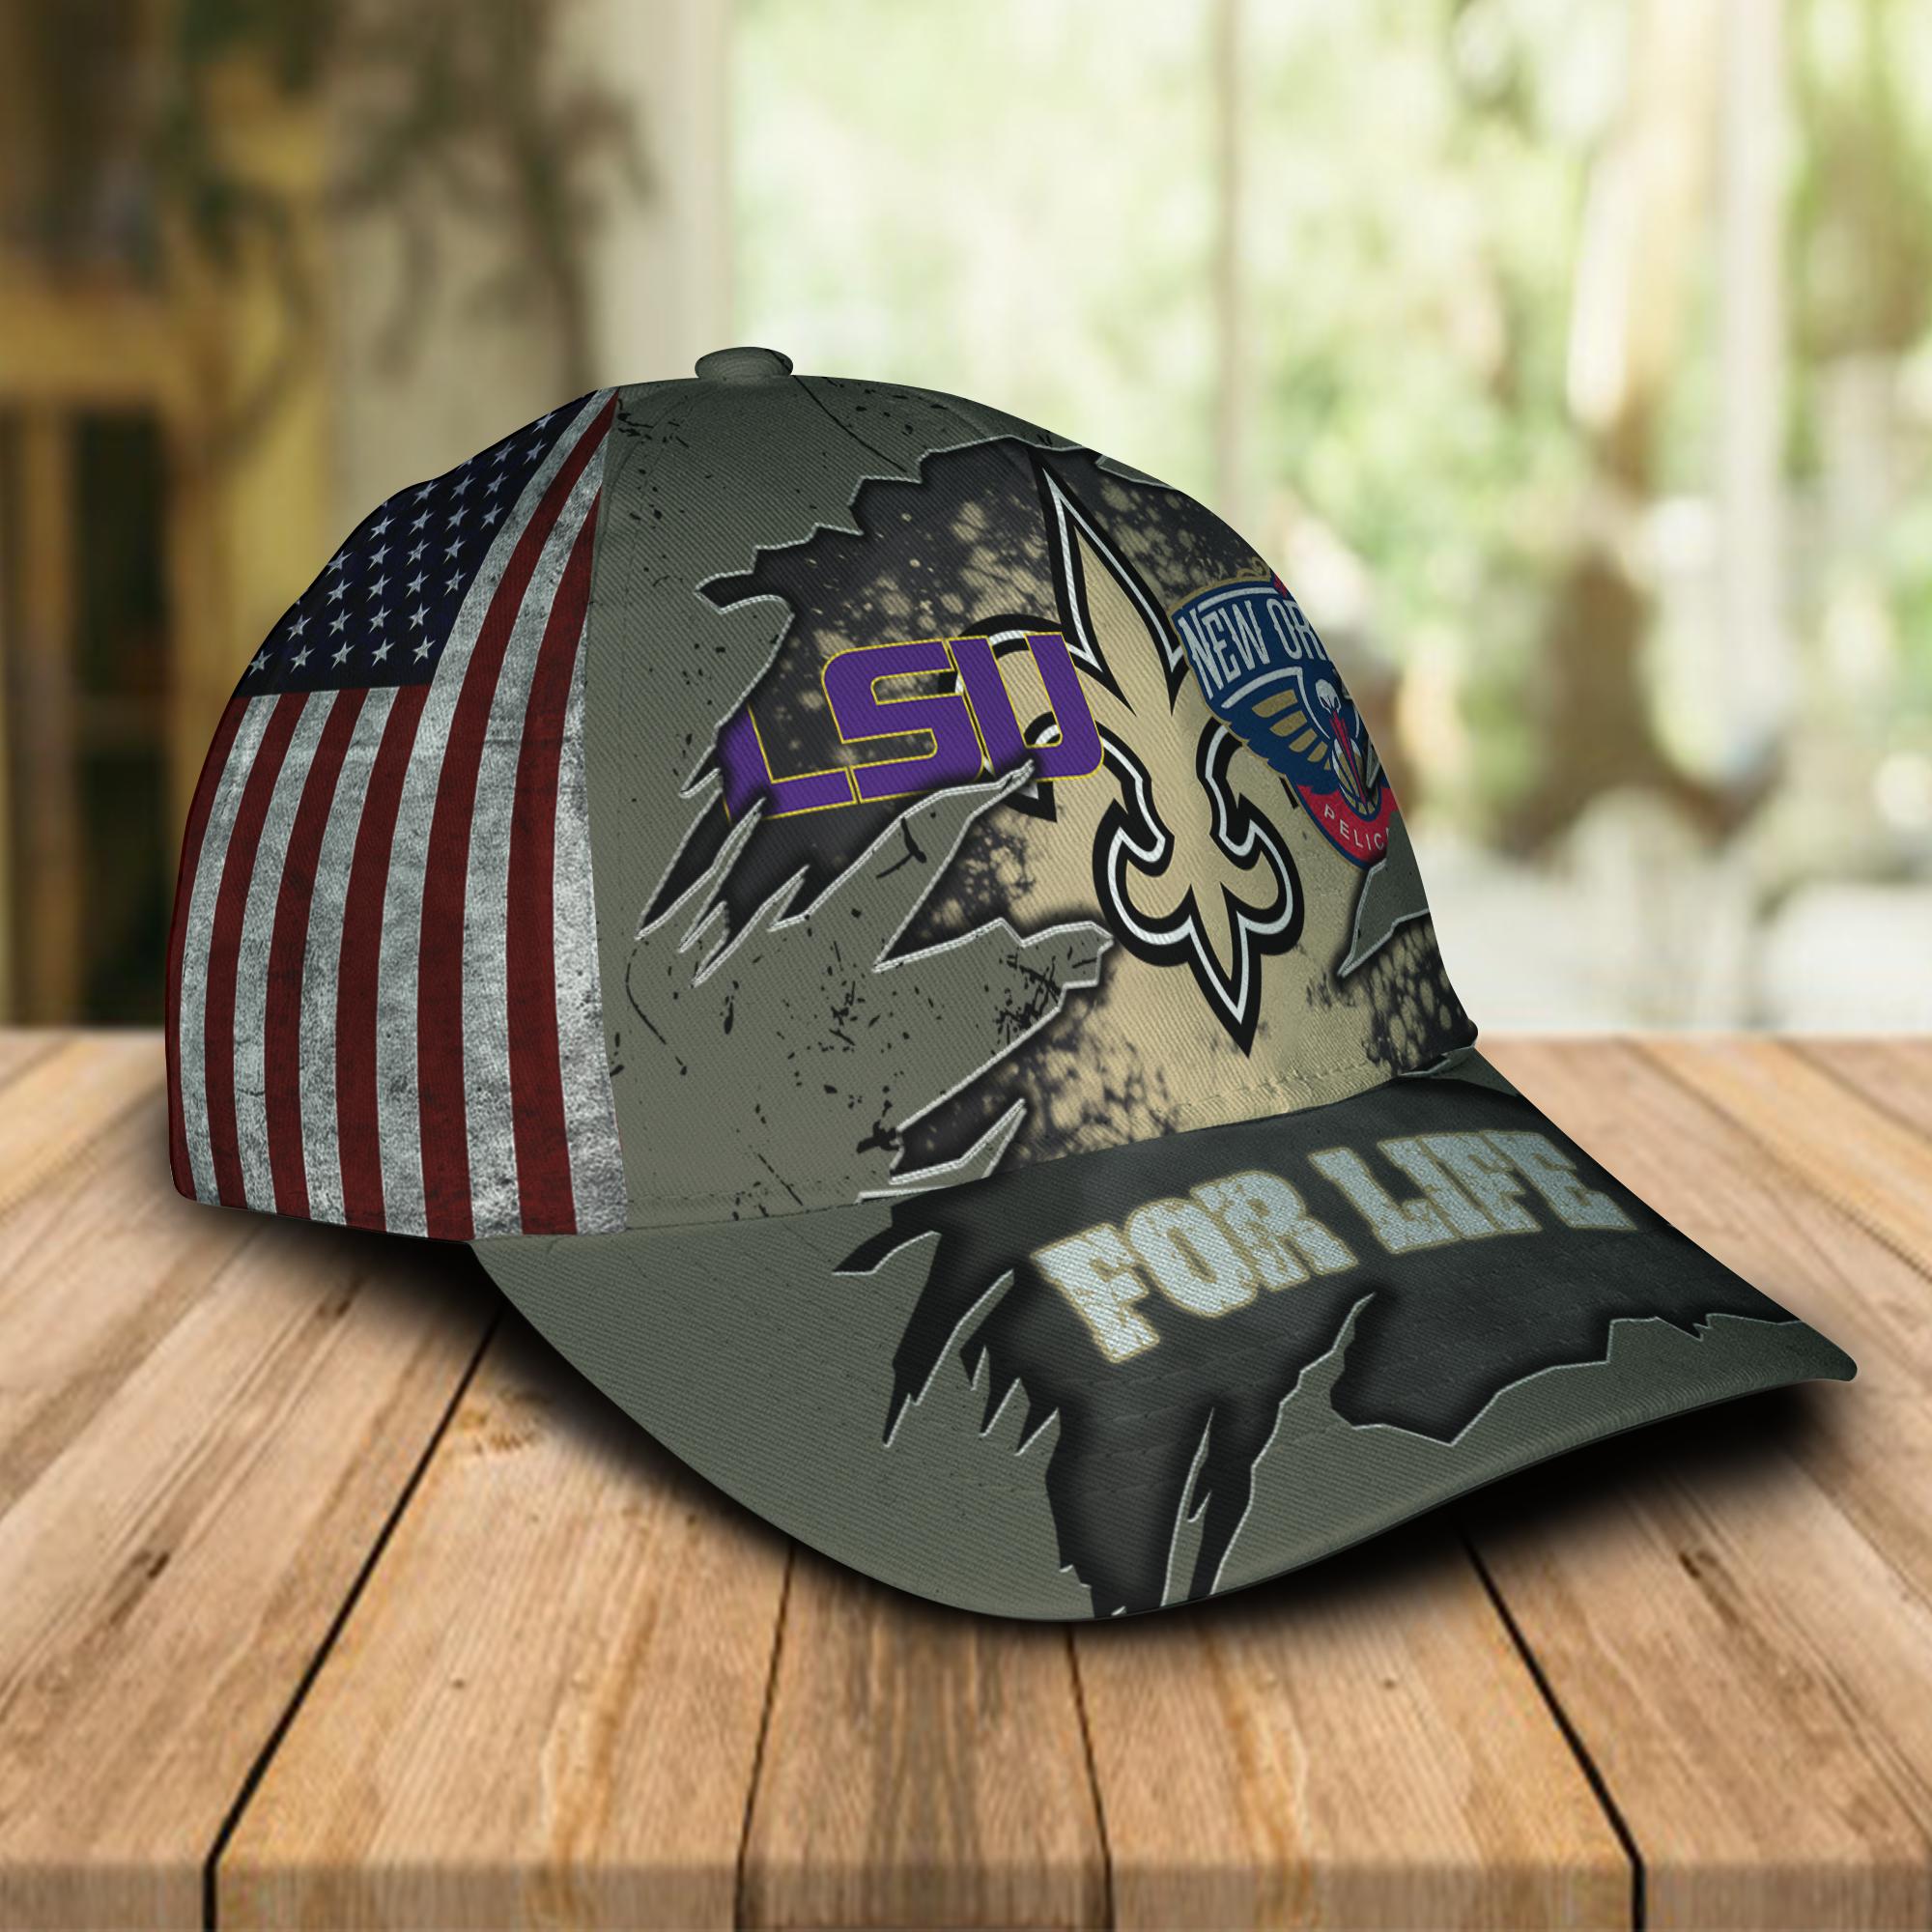 New Orleans Saints New Orleans Pelicans LSU Tigers For Life Hat Cap -1